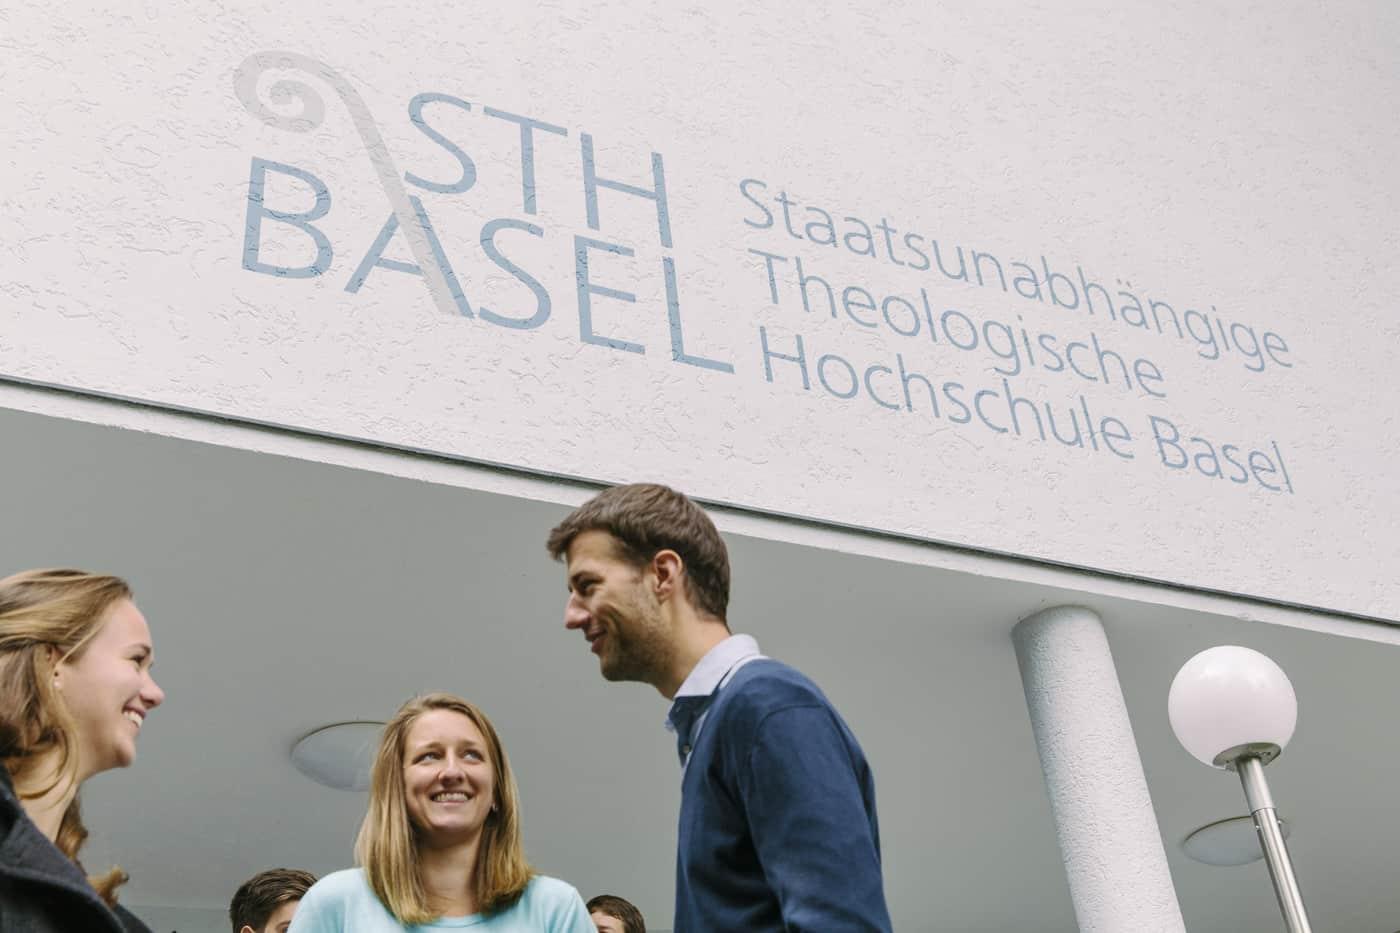 Sth Basel Aussenansicht Gebaeude